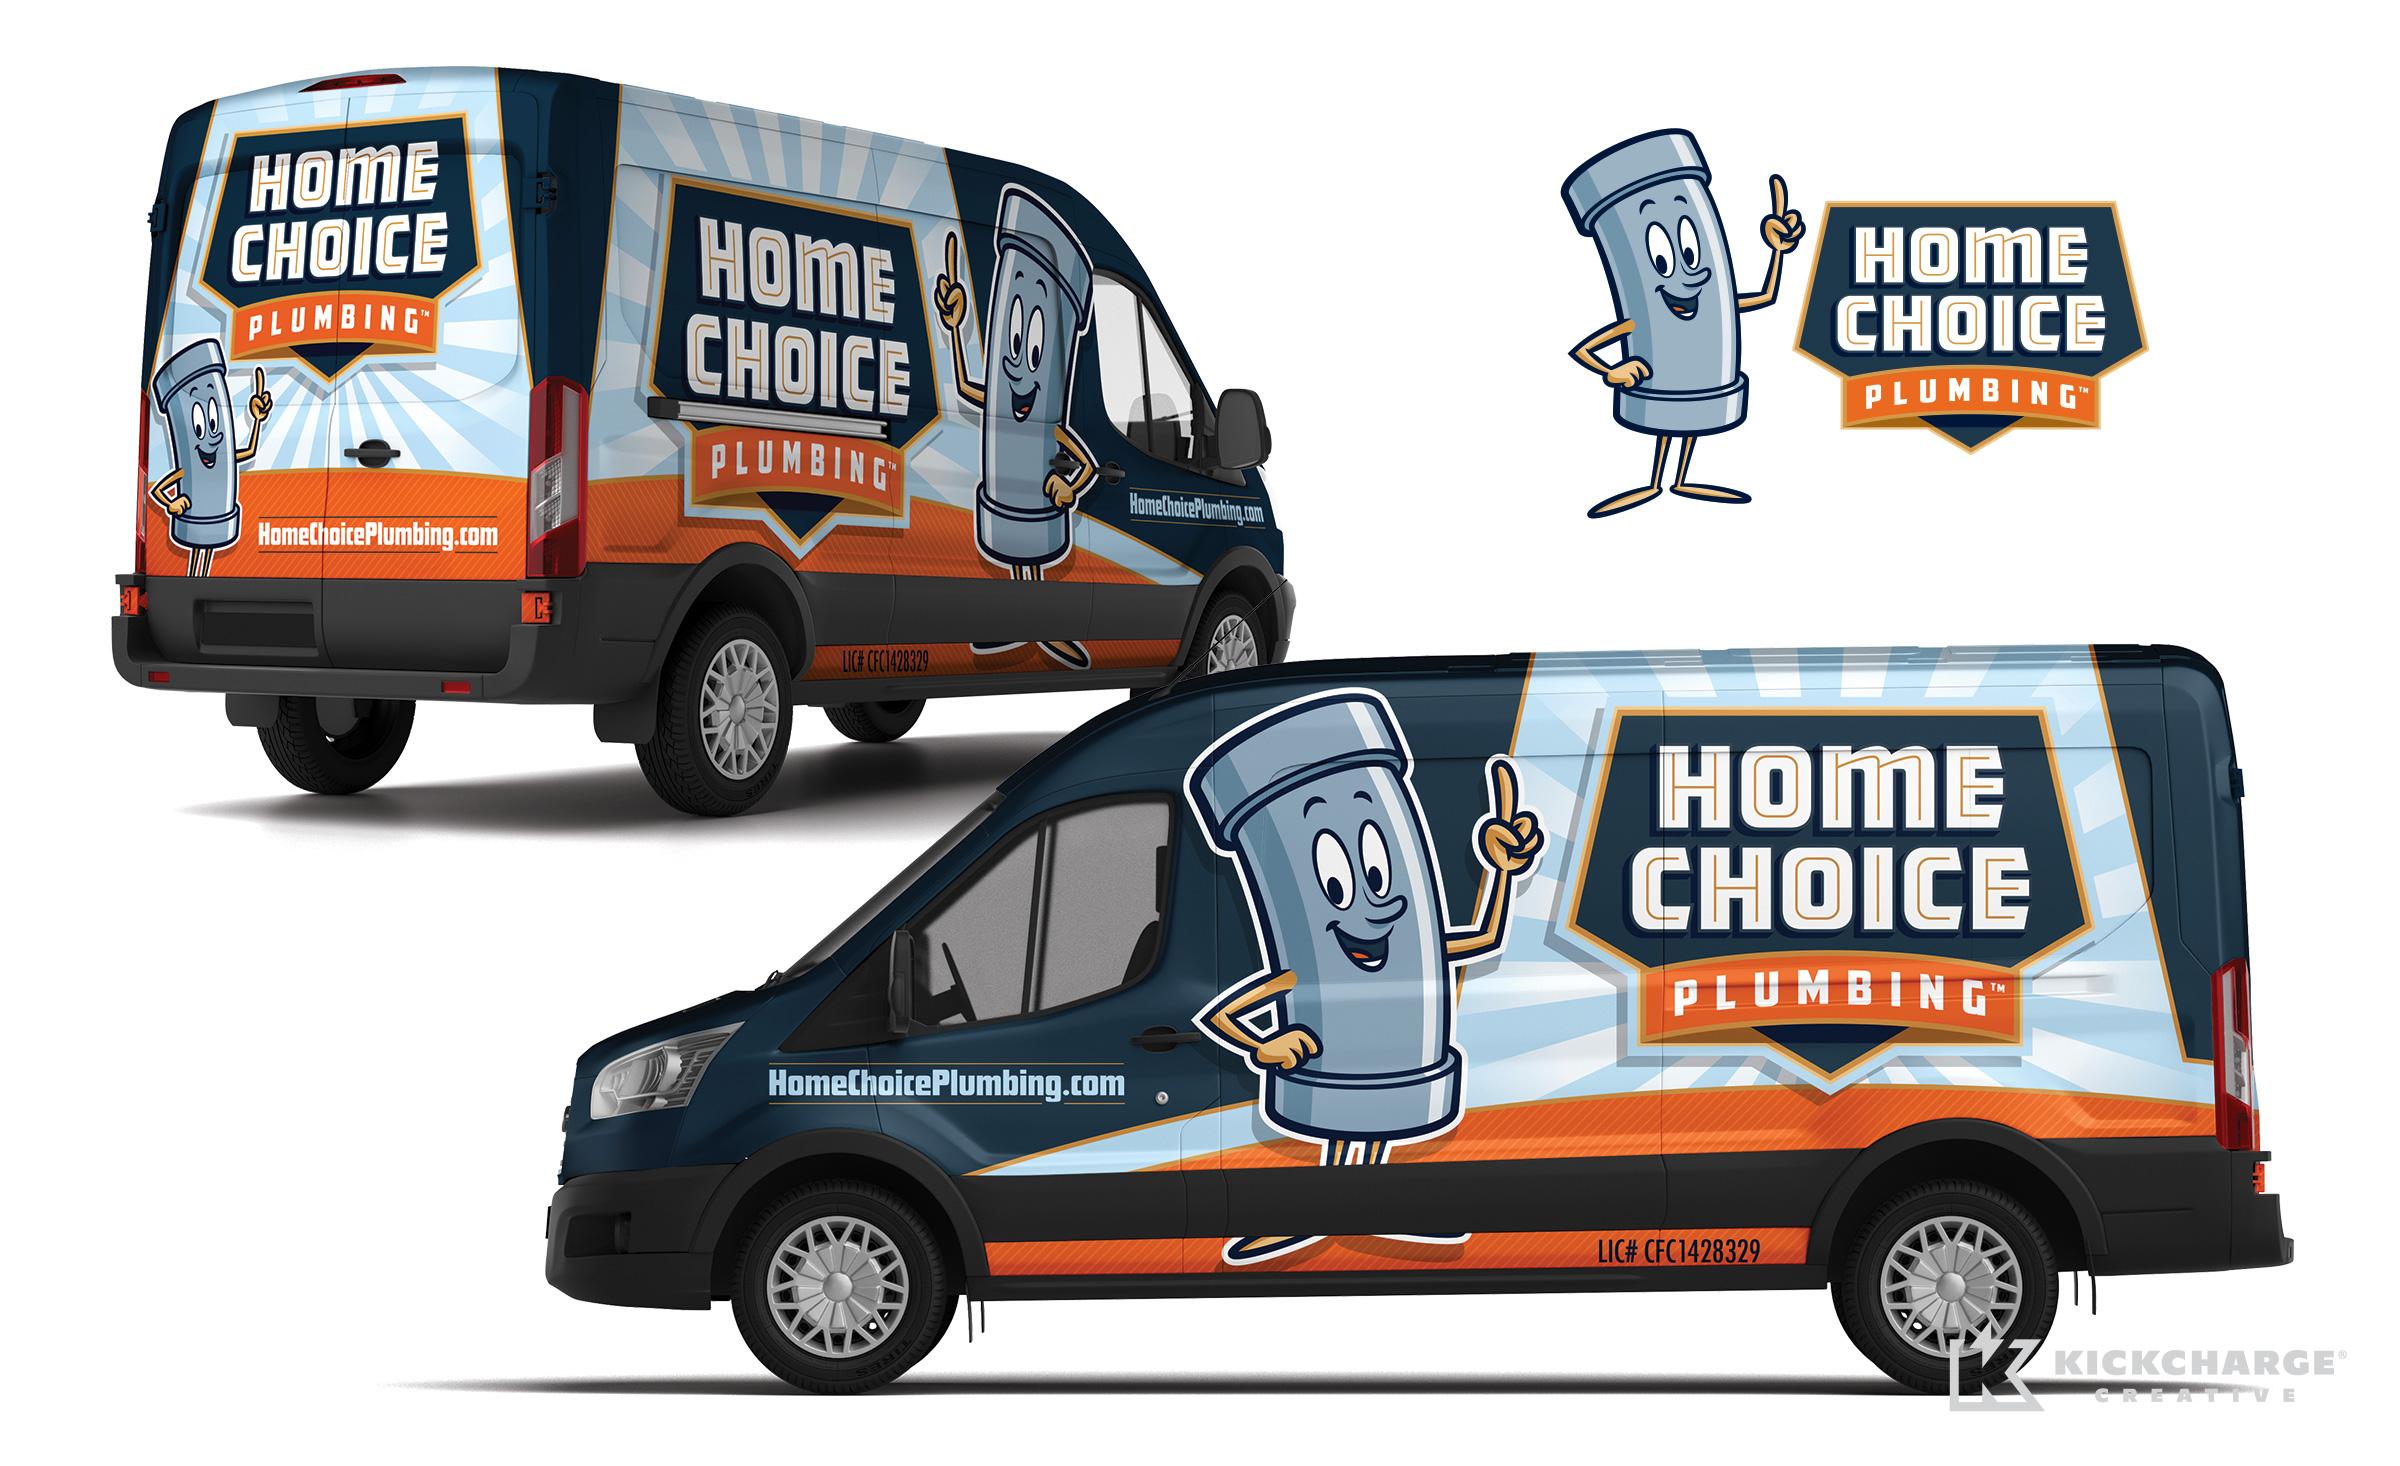 plumbing truck wrap for Home Choice Plumbing